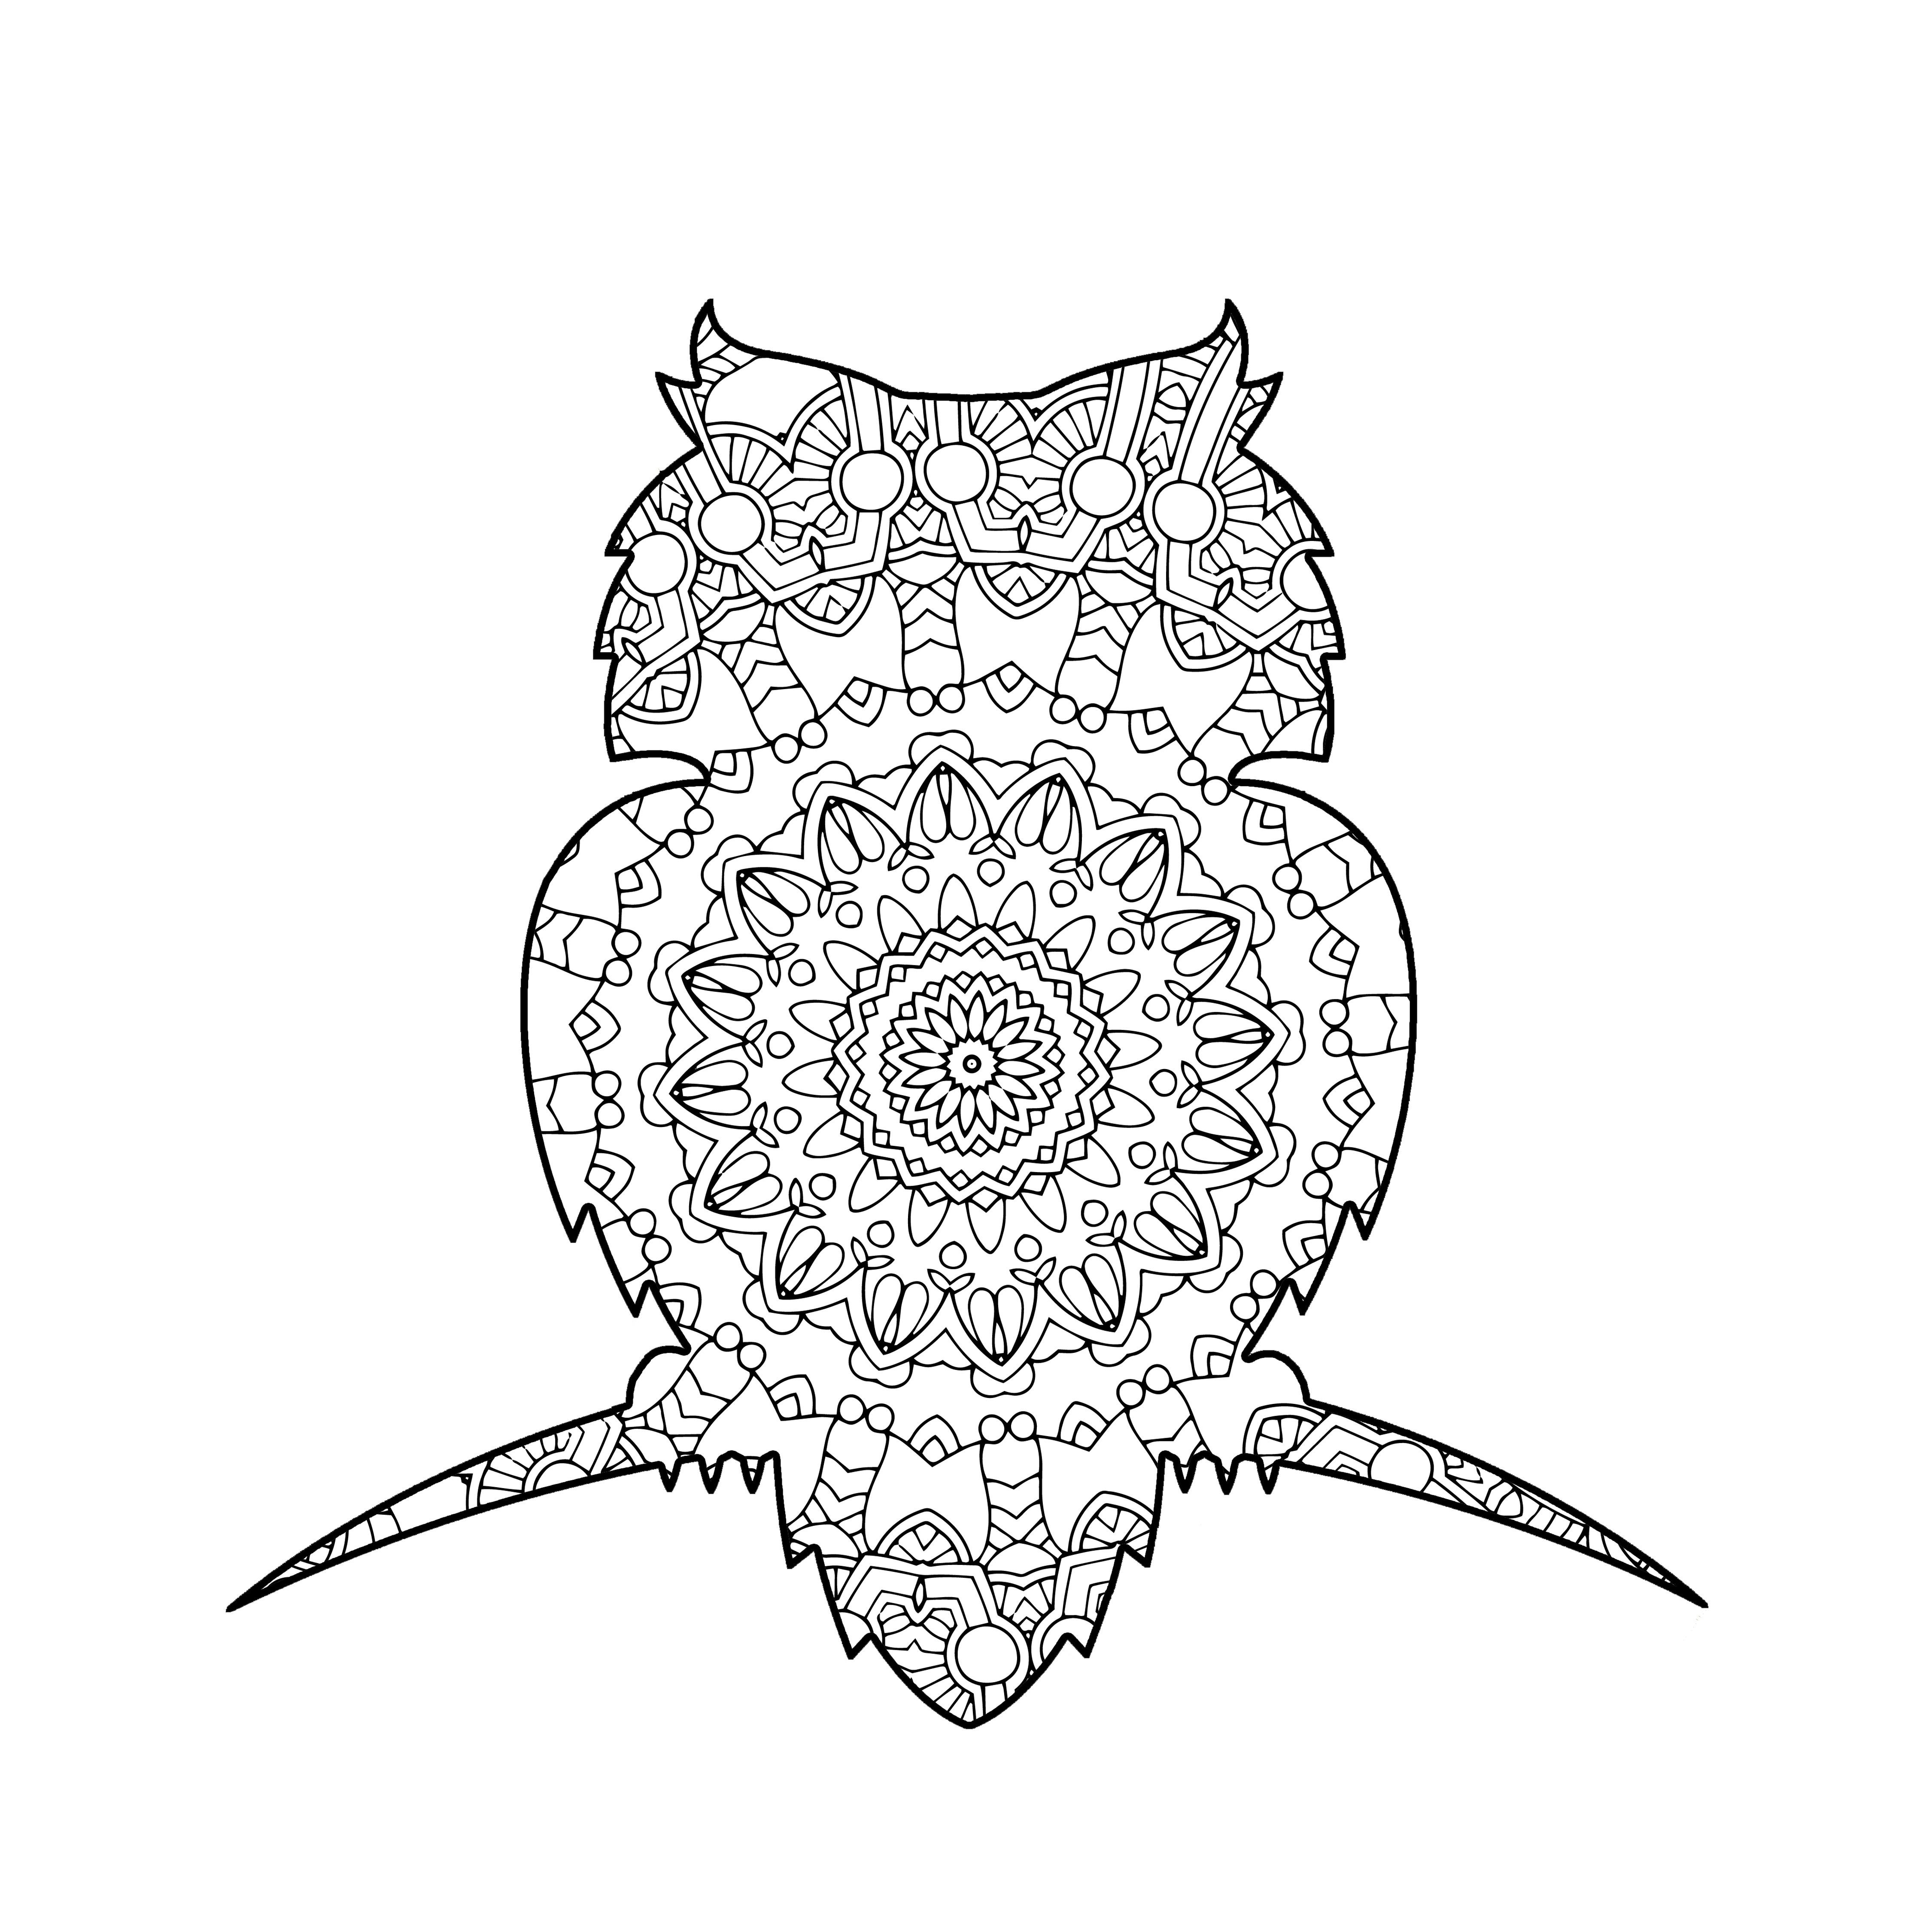 coloring to calm  volume three  u2013 animals